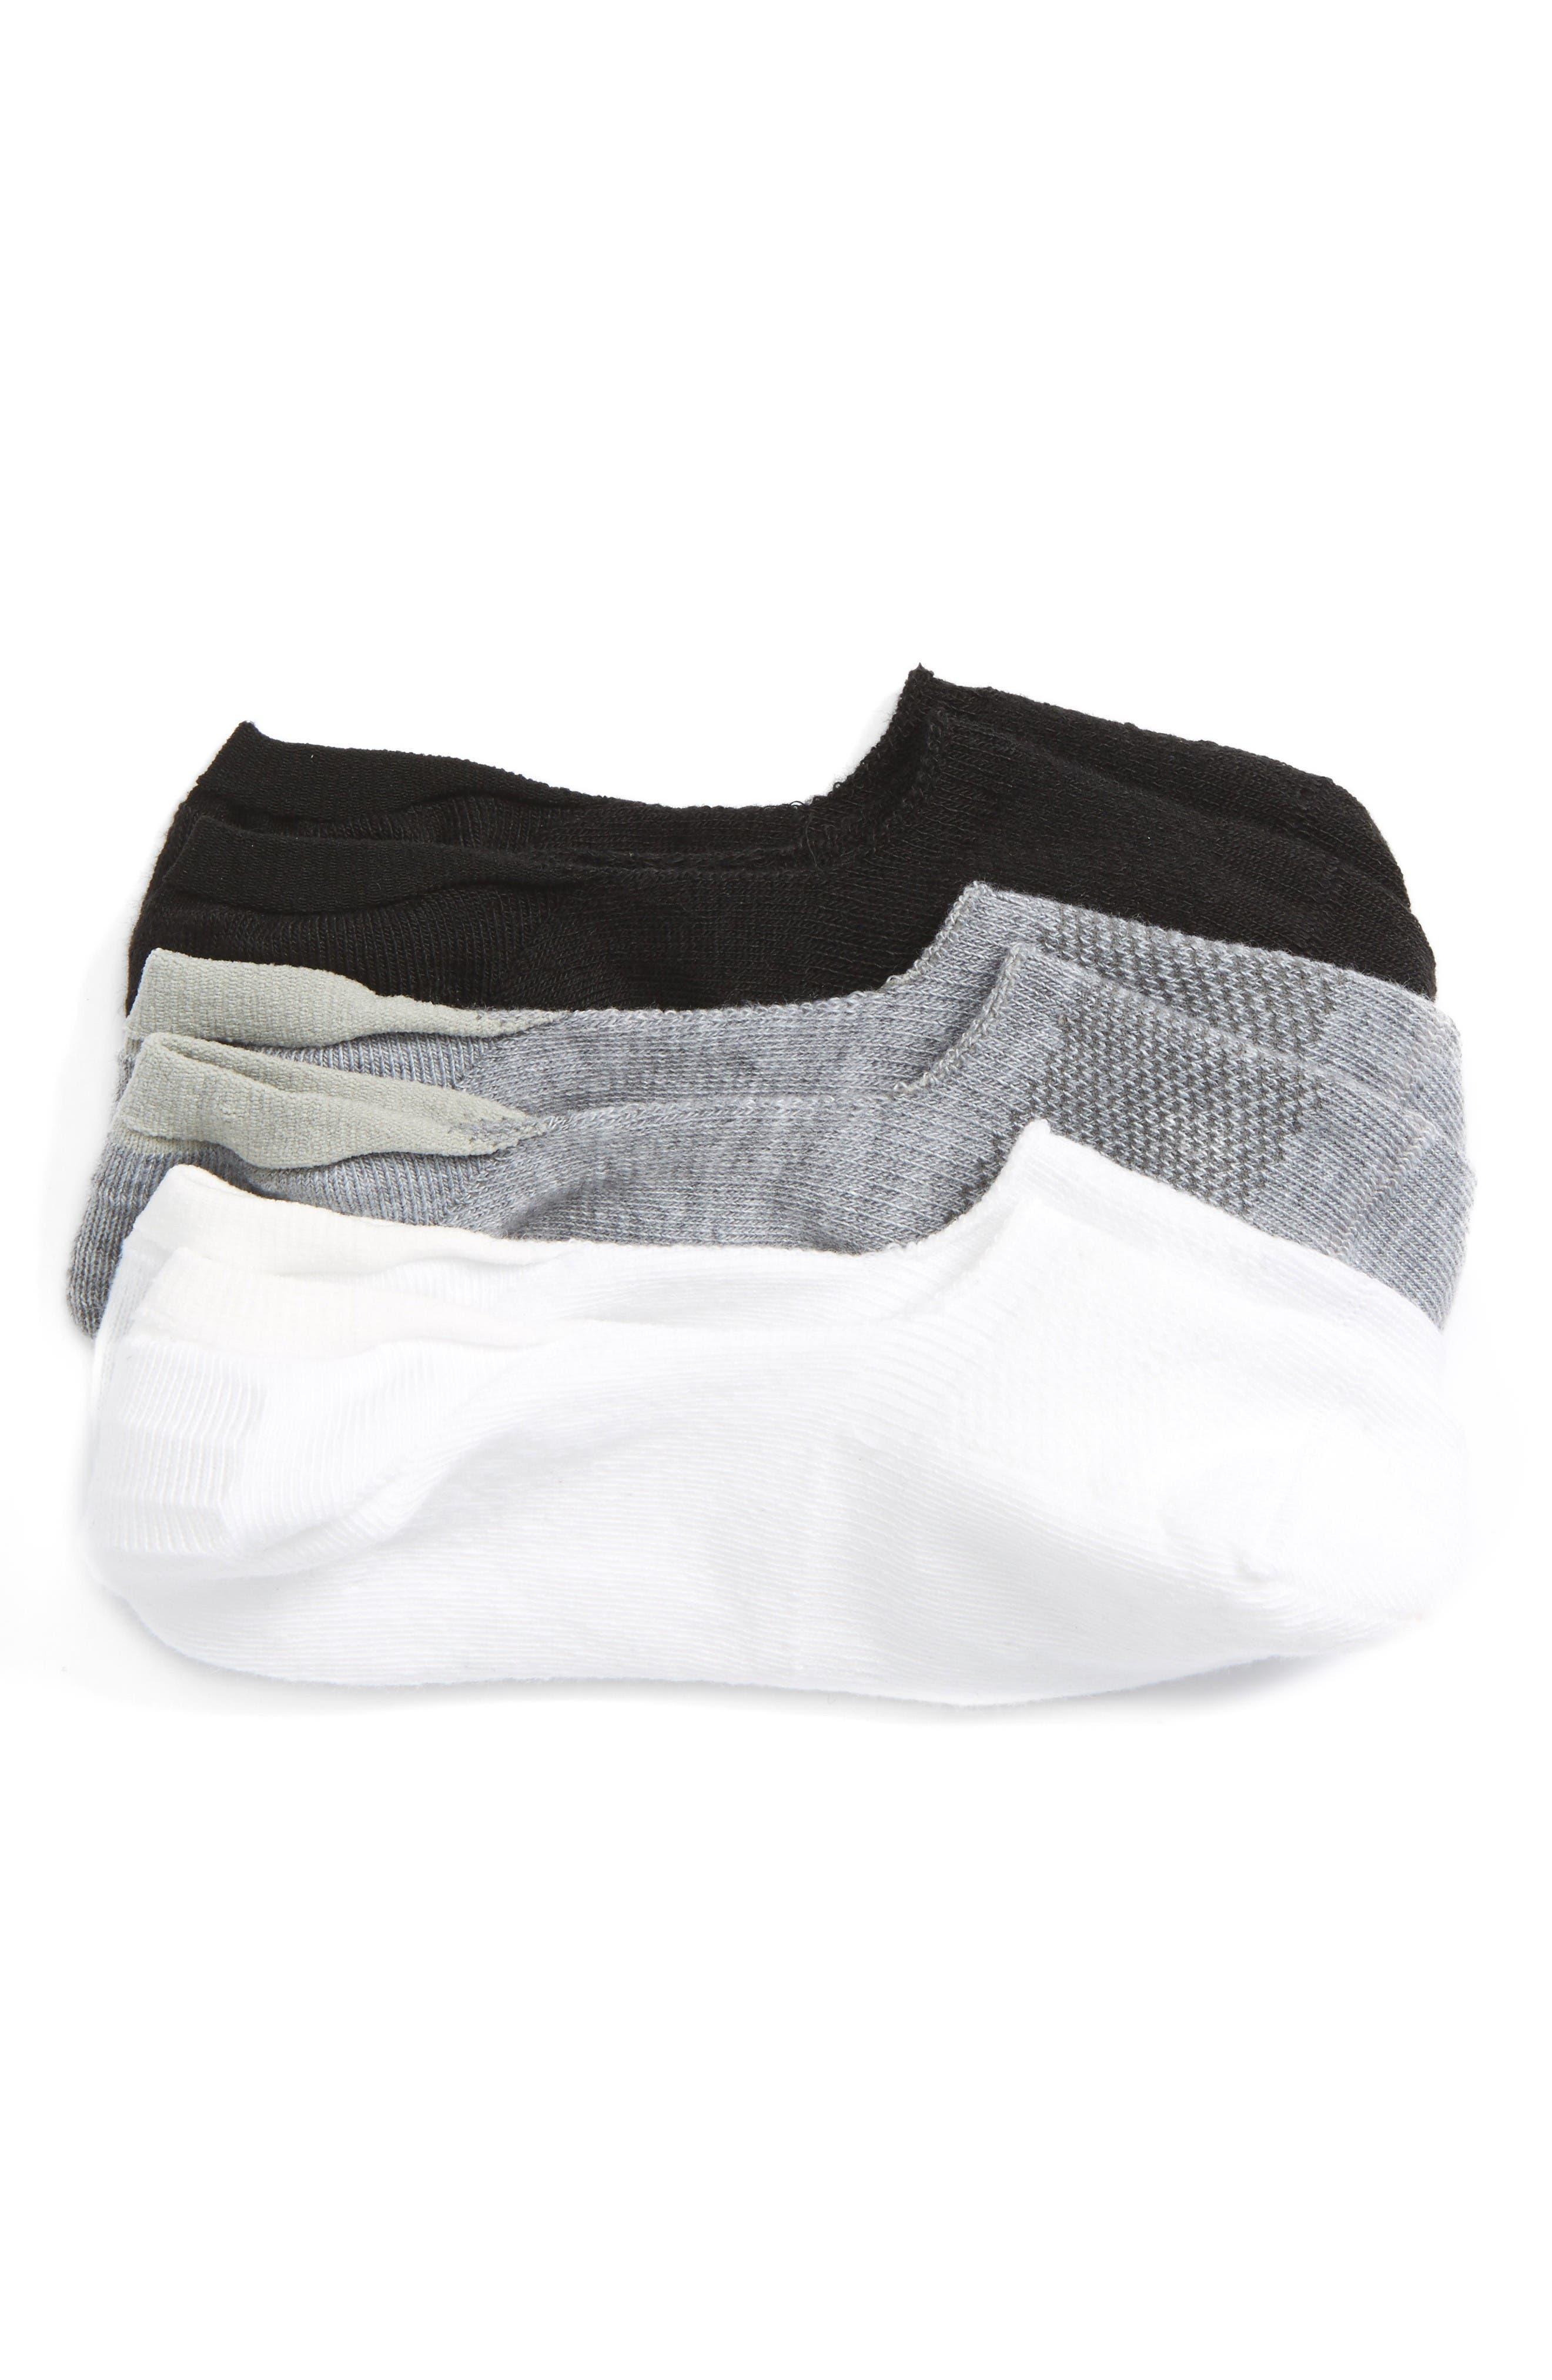 Alternate Image 1 Selected - Tucker + Tate Assorted 3-Pack Liner Socks (Walker, Toddler, Little Kid & Big Kid)